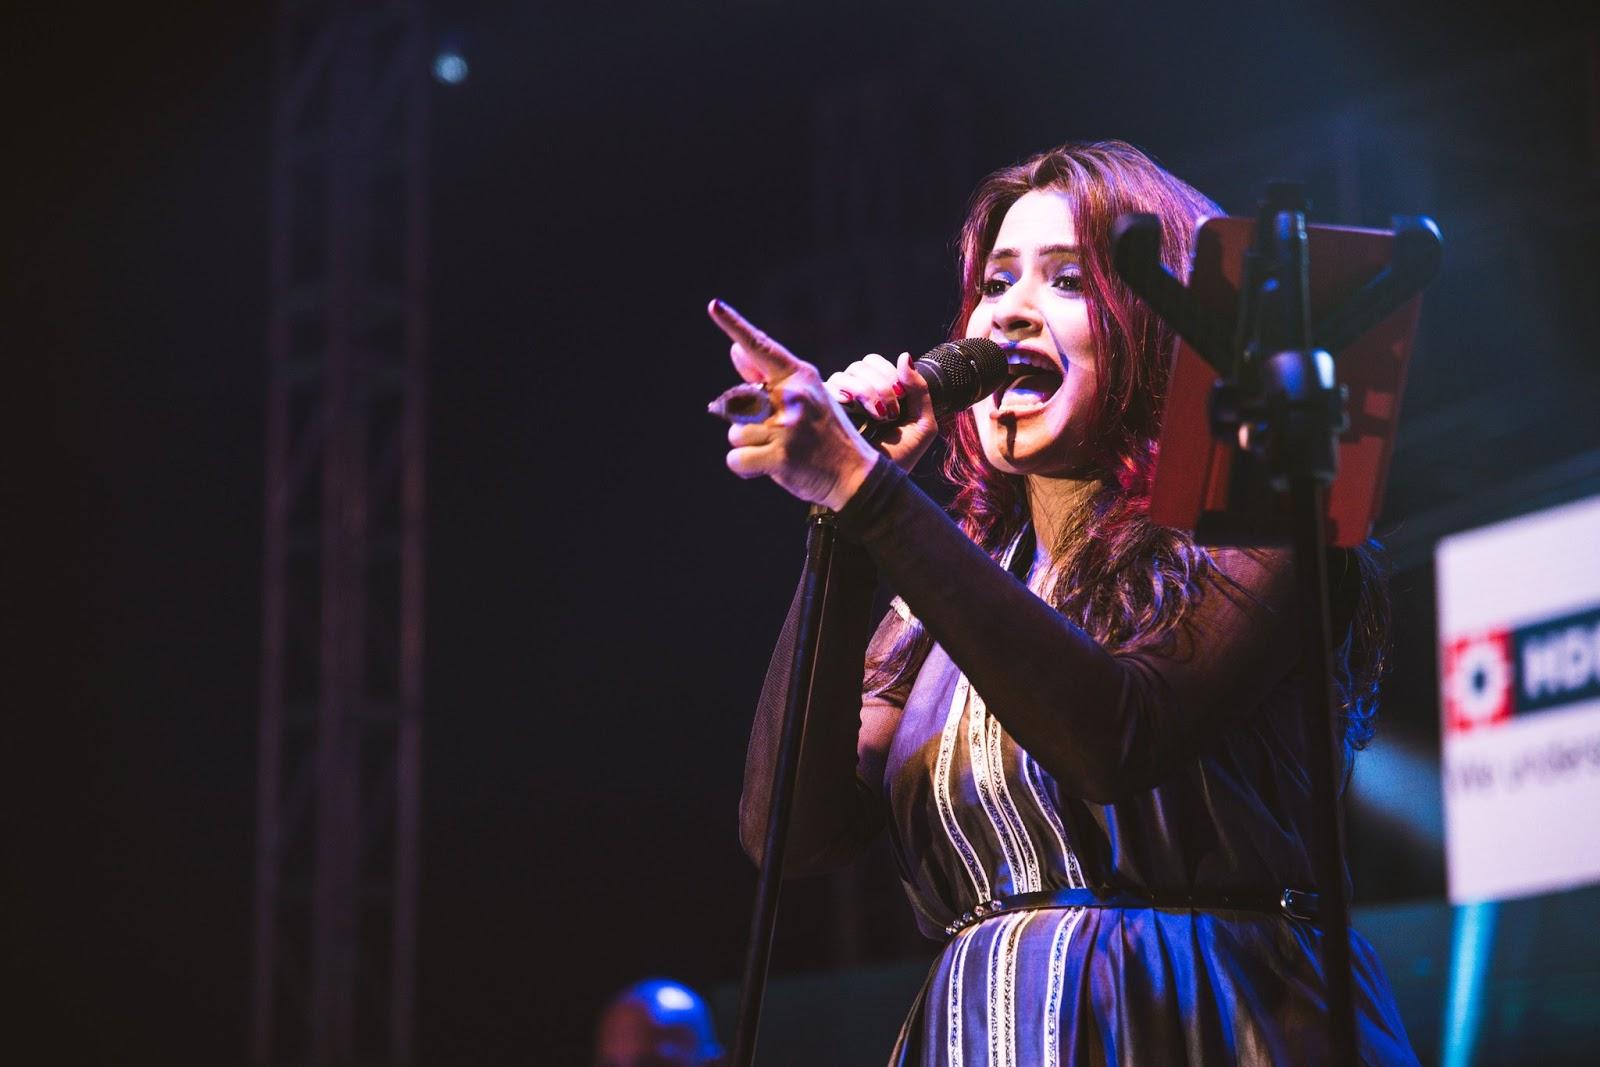 sona-mohapatra-most-beautiful-singer